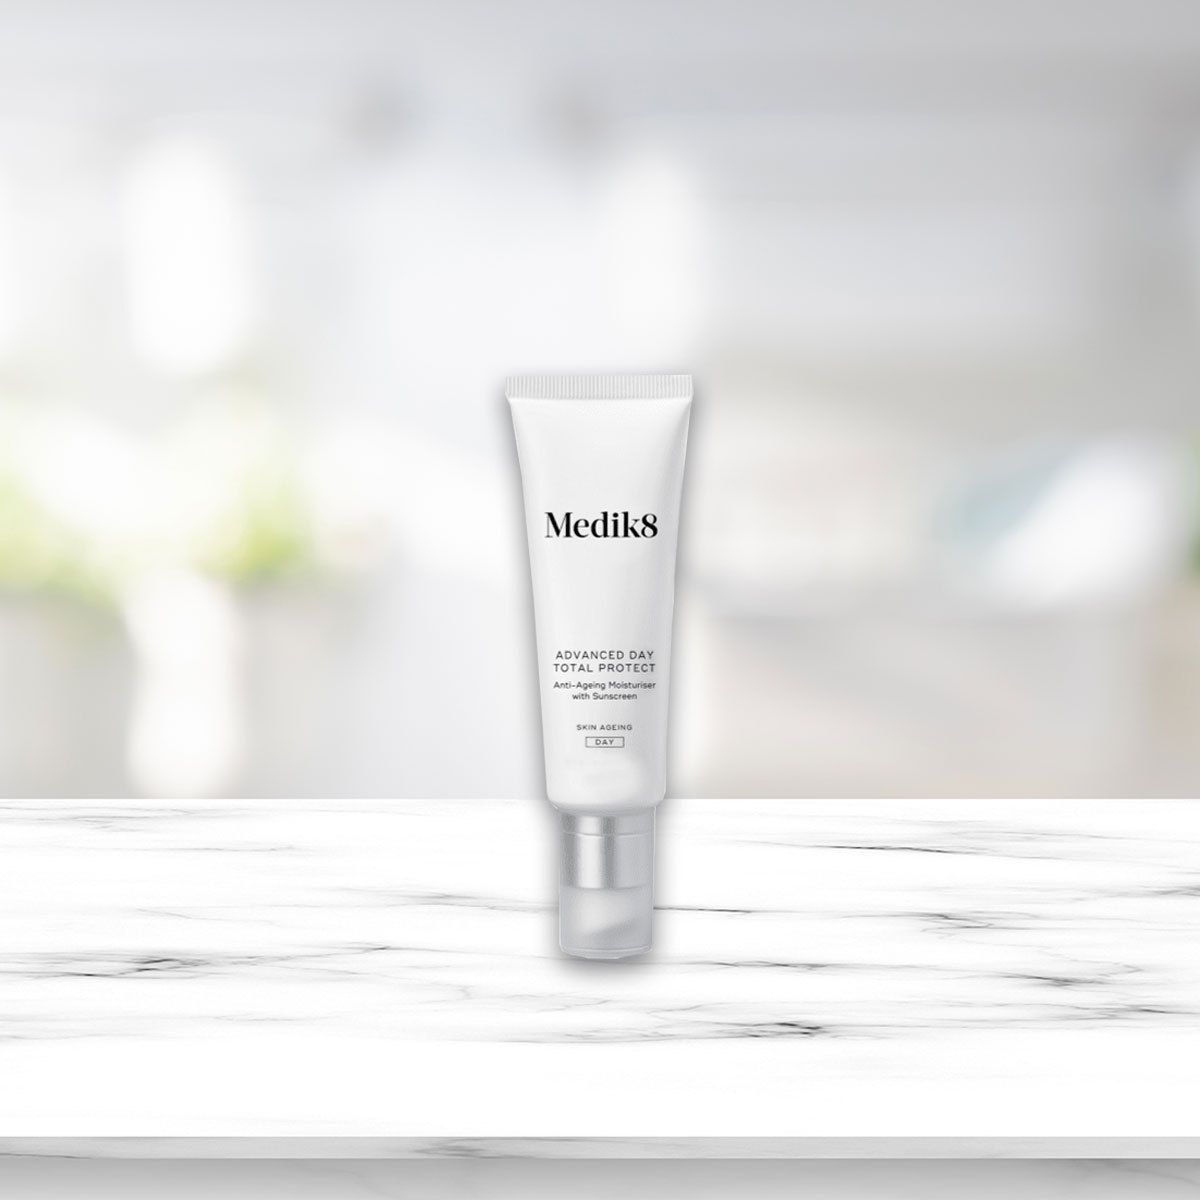 Medik8 Offer in 2020 Skin care, Free gifts, Offer